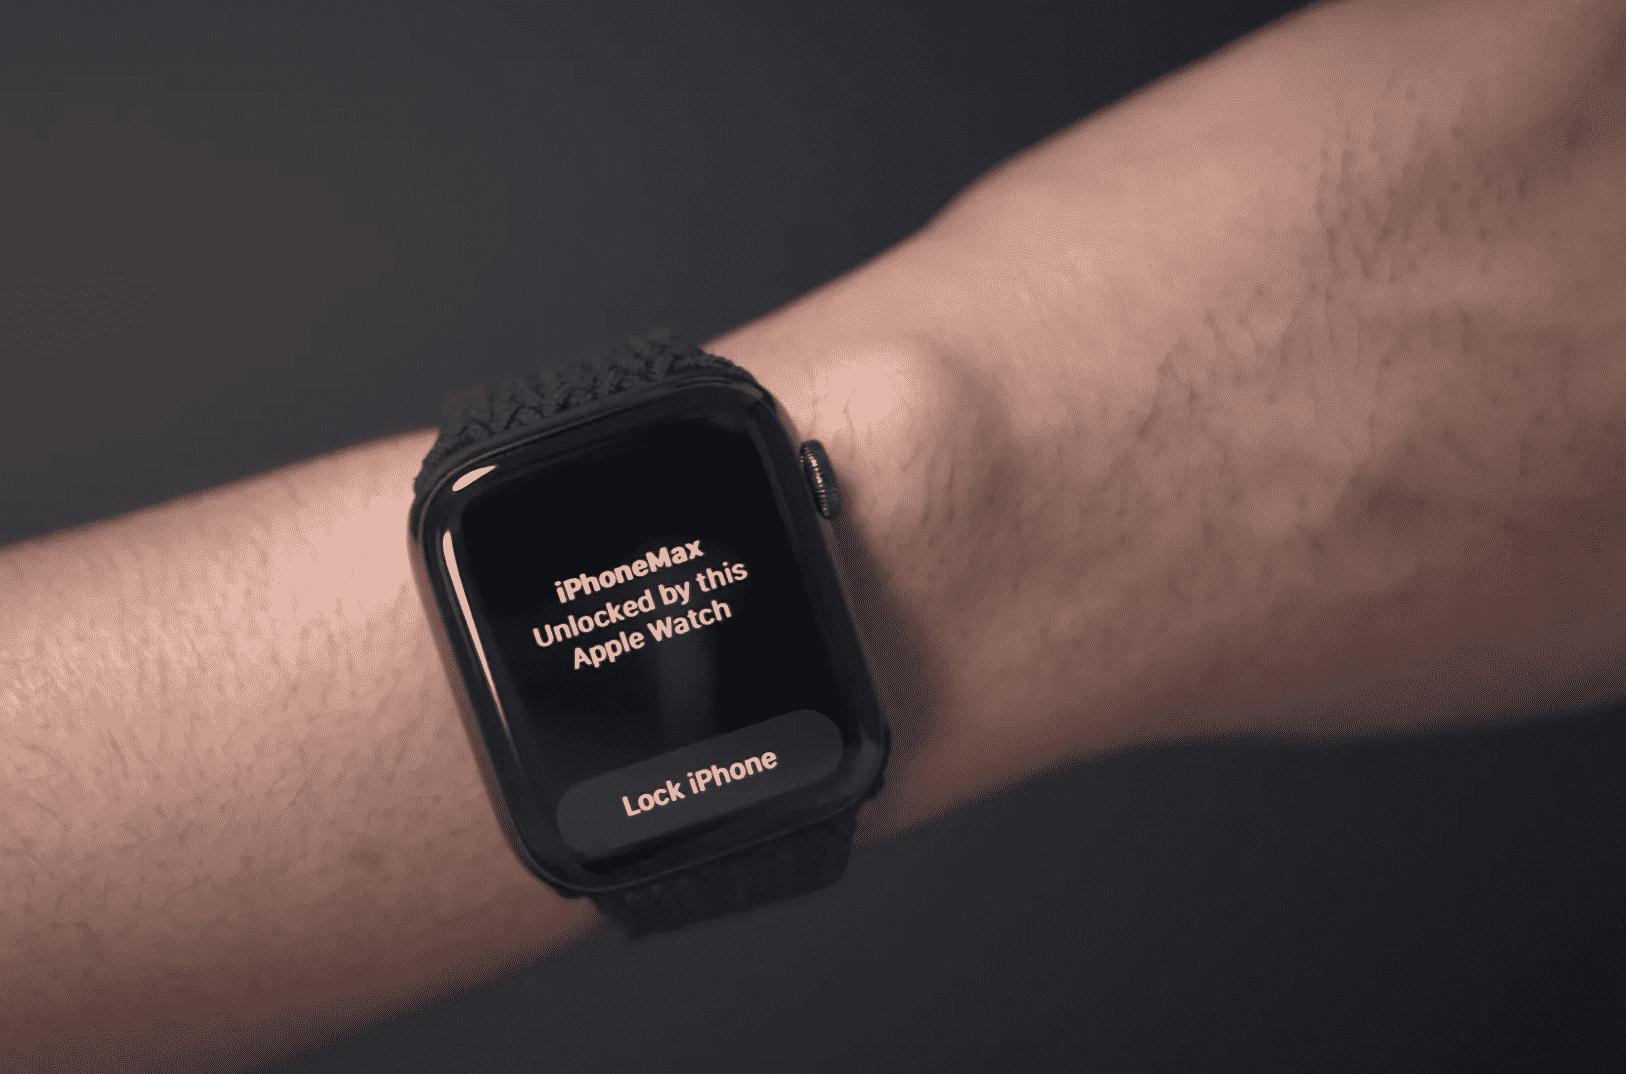 Unlock with Apple Watch